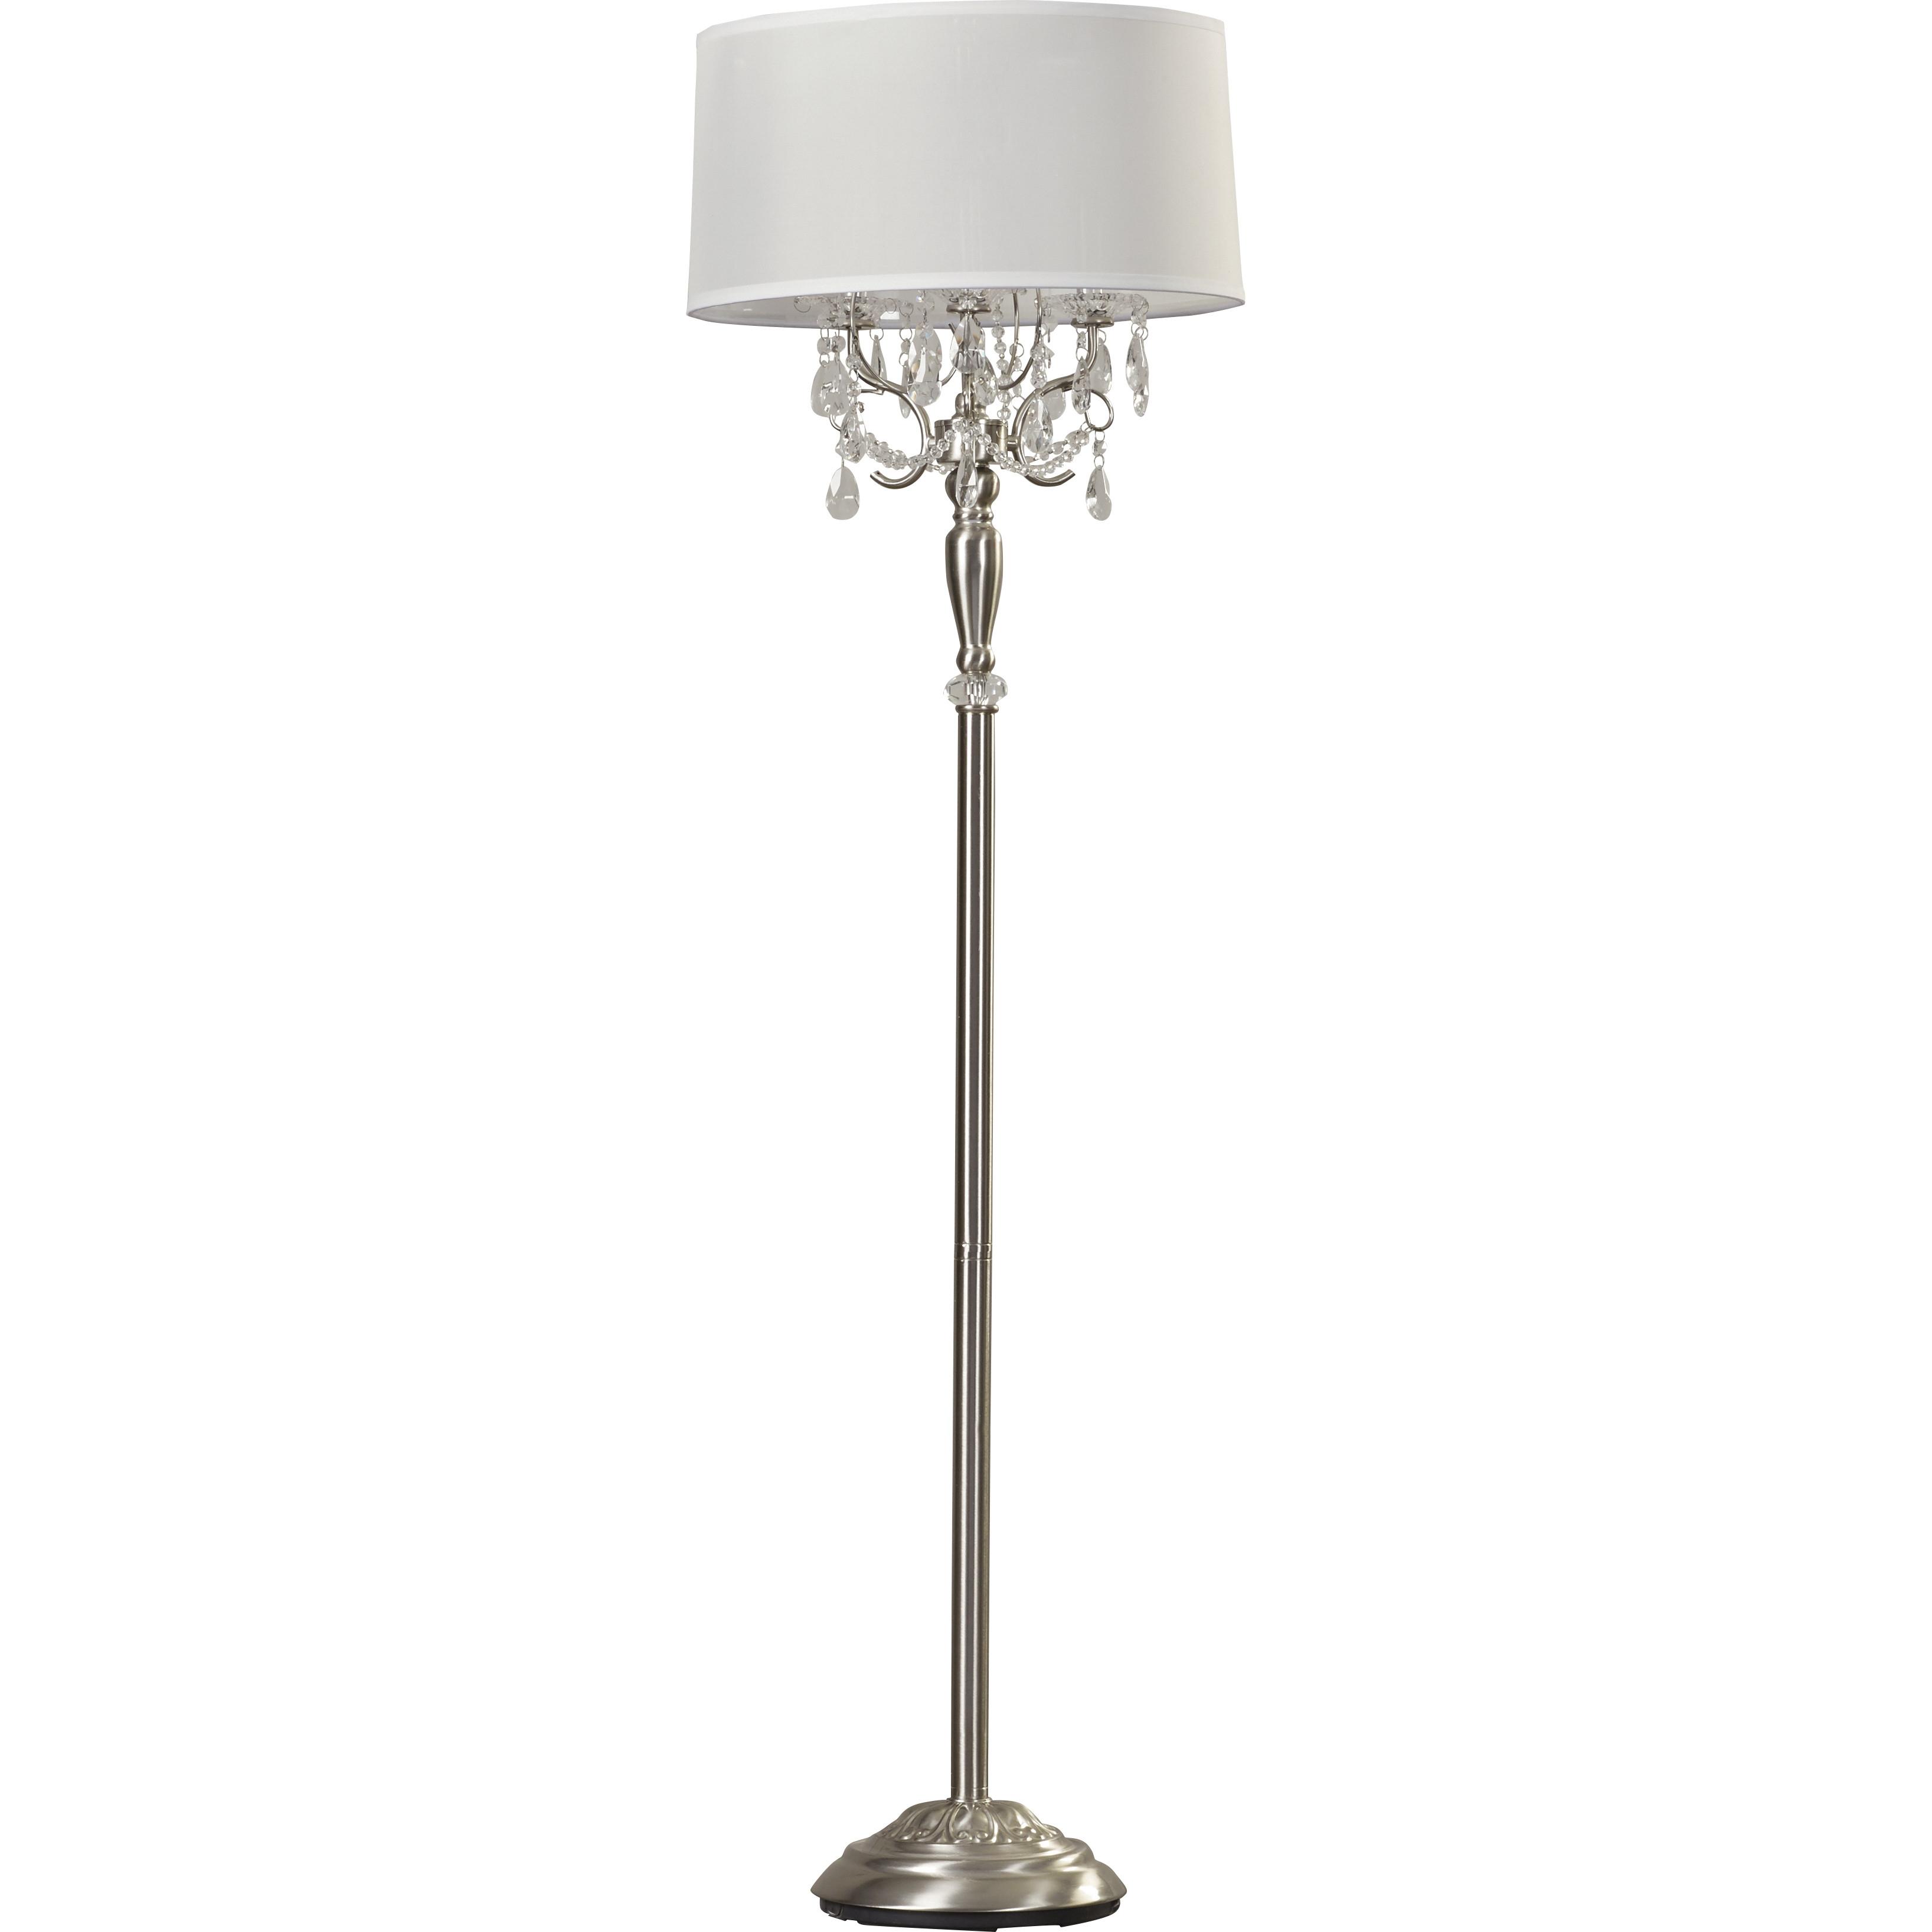 Lights Crystal Floor Lamp Luxury Floor Lamp Stacked Crystal Throughout Standing Chandelier Floor Lamps (Image 17 of 25)